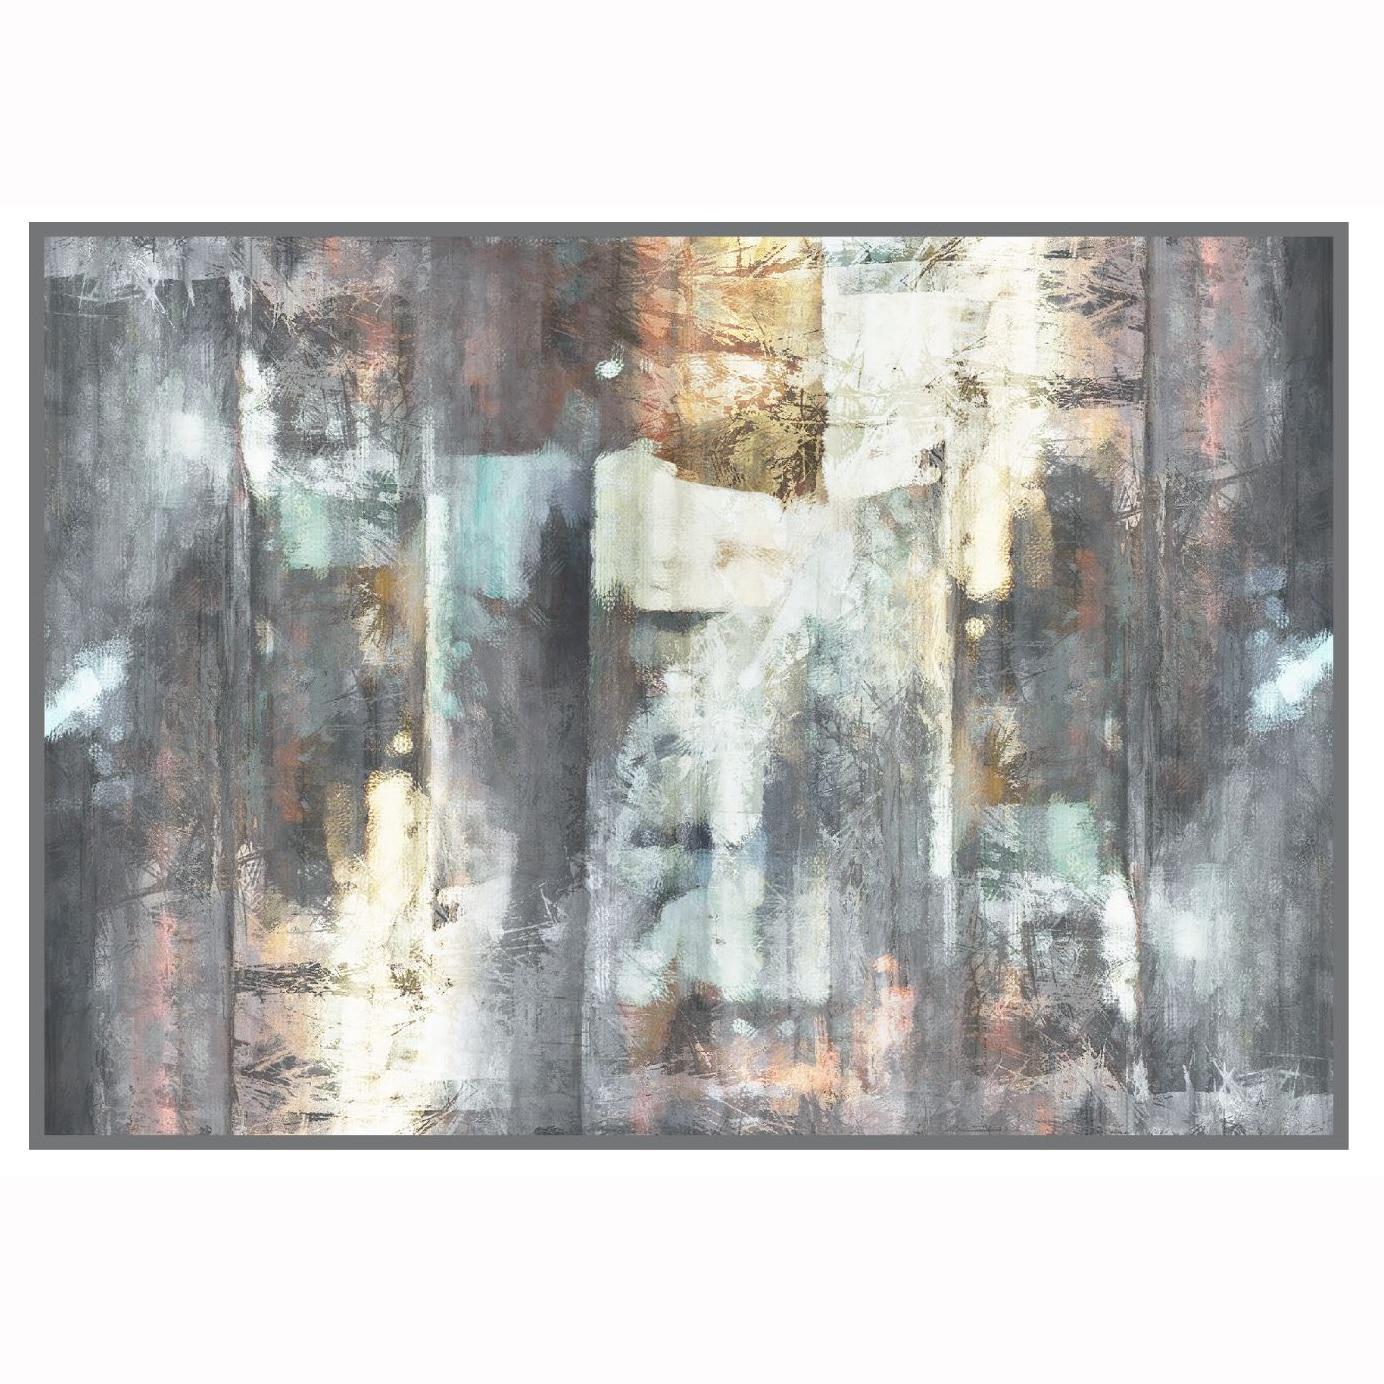 Fotografie Covor cu print digital Kring Bangalore, 160x230 cm, 100% bumbac, Multicolor